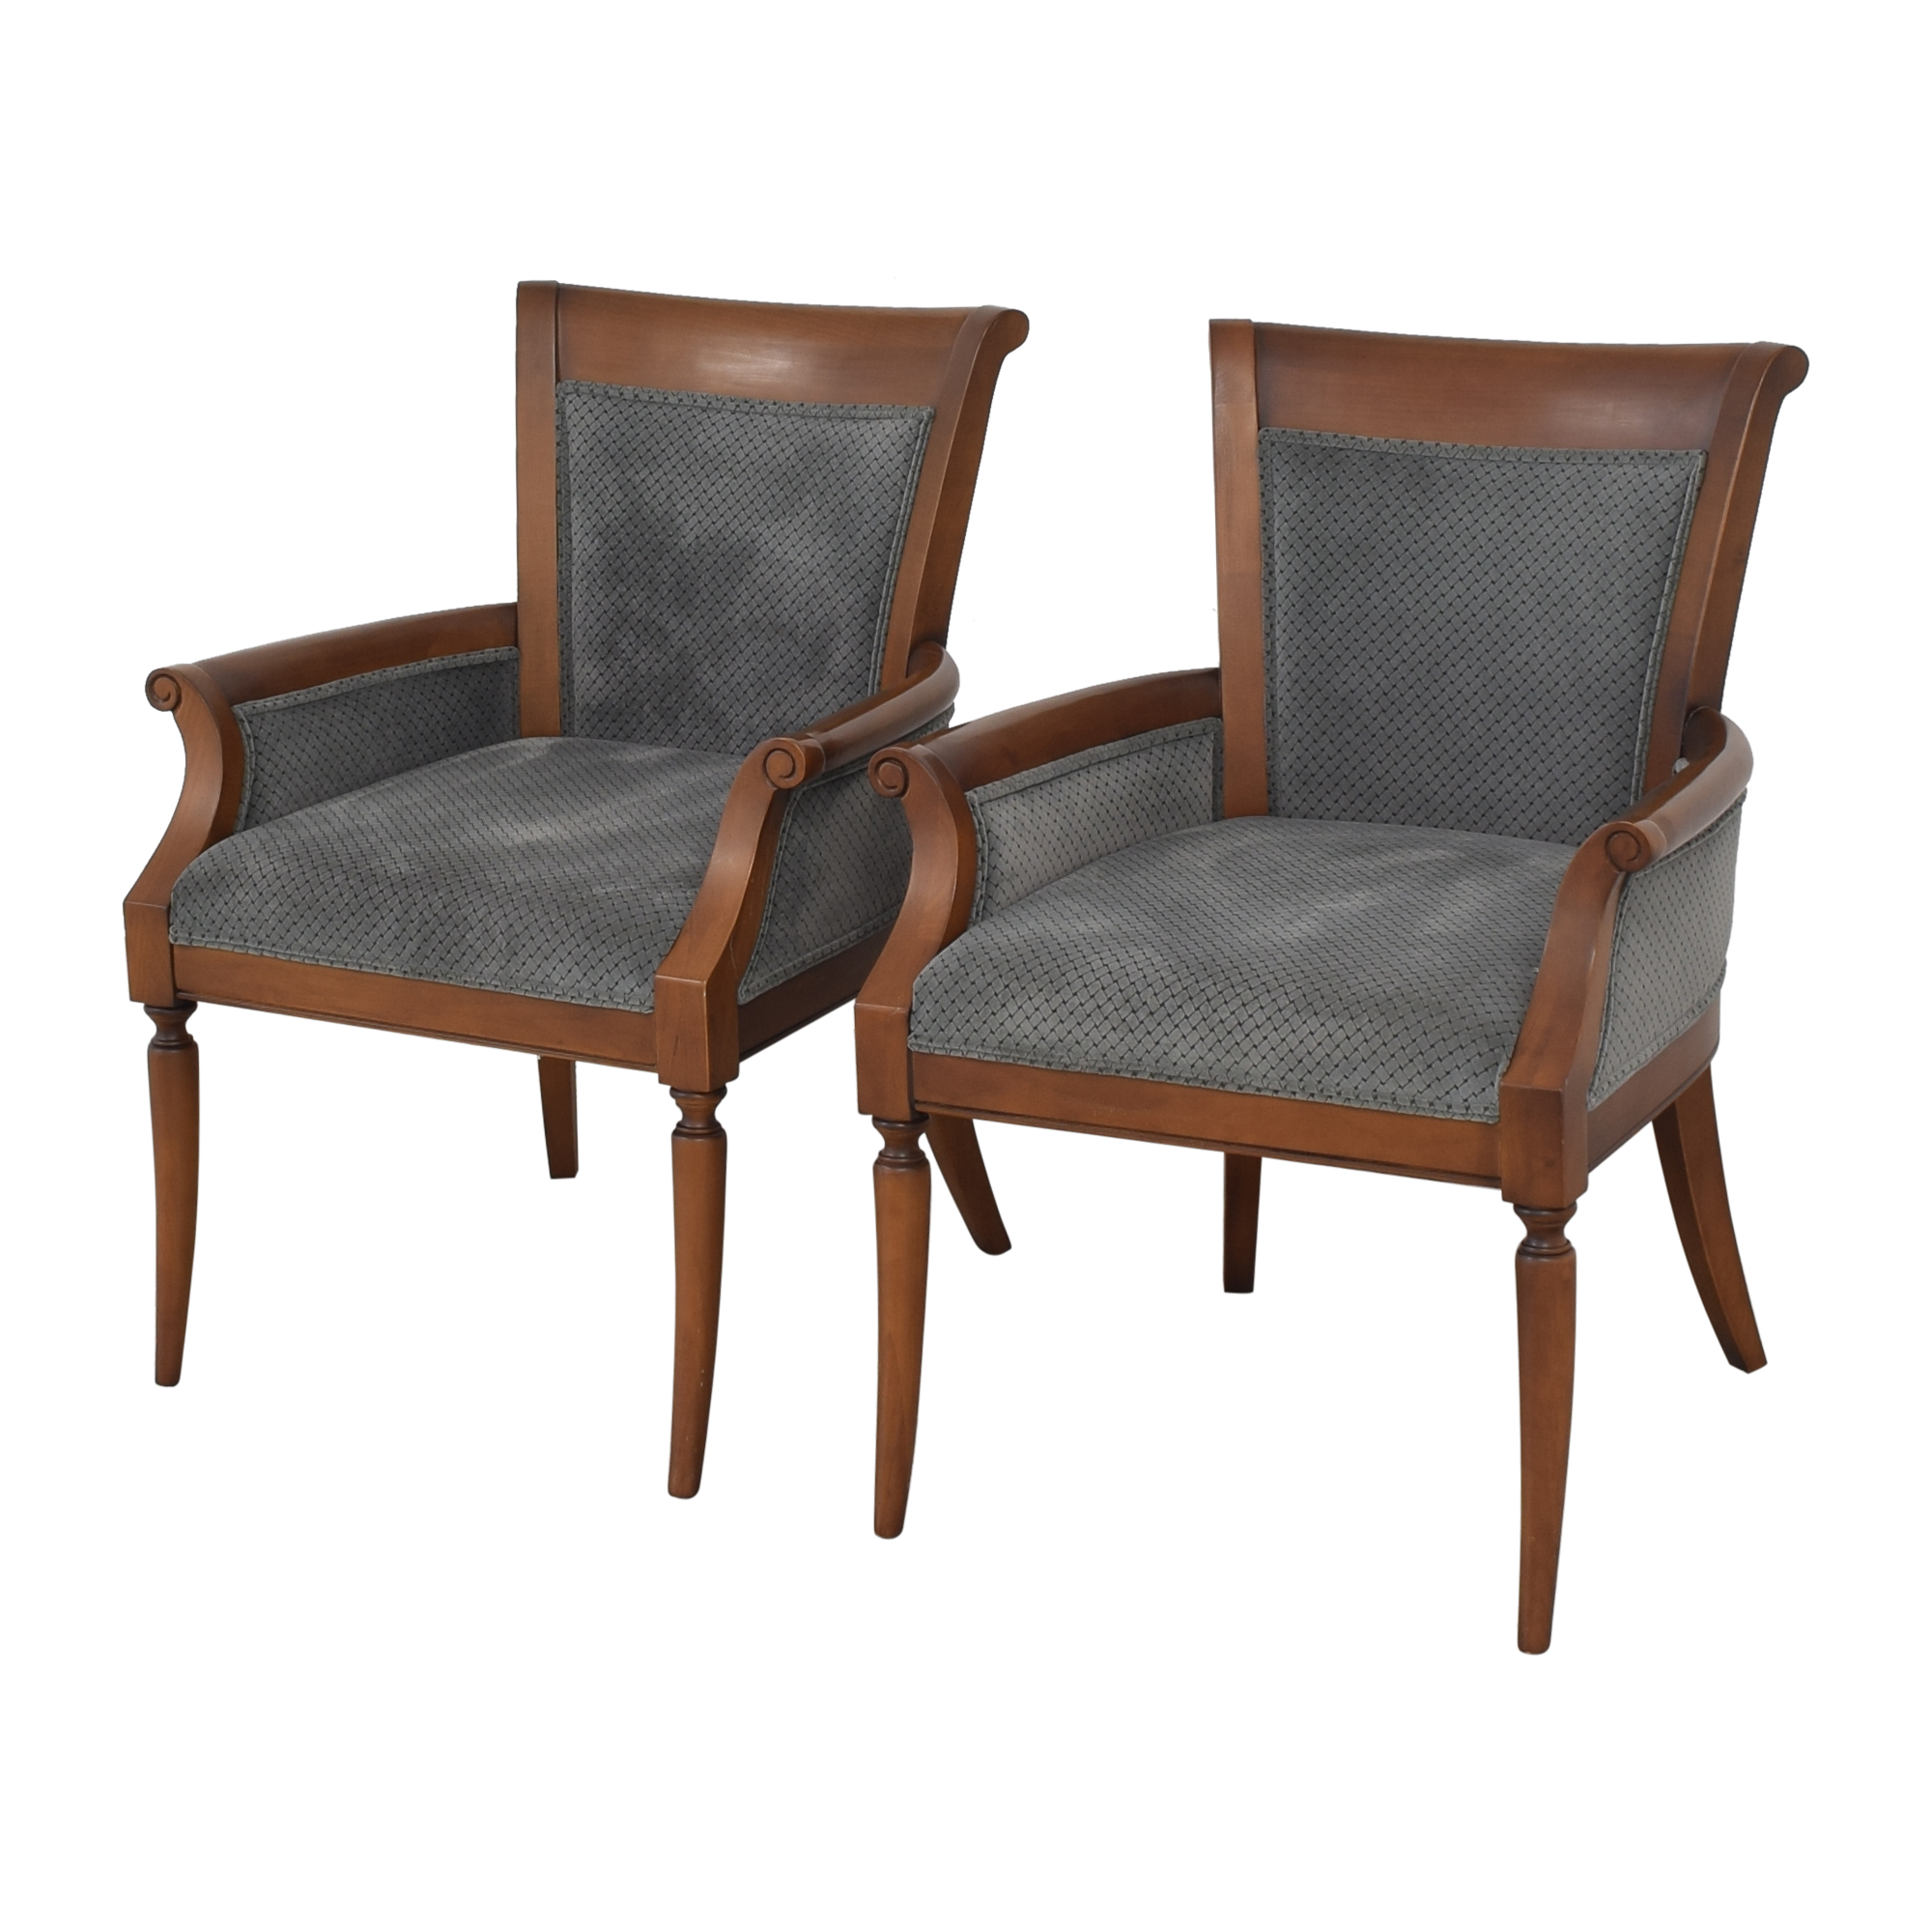 Hekman Furniture Hekman Aberdeen Accent Chairs nj